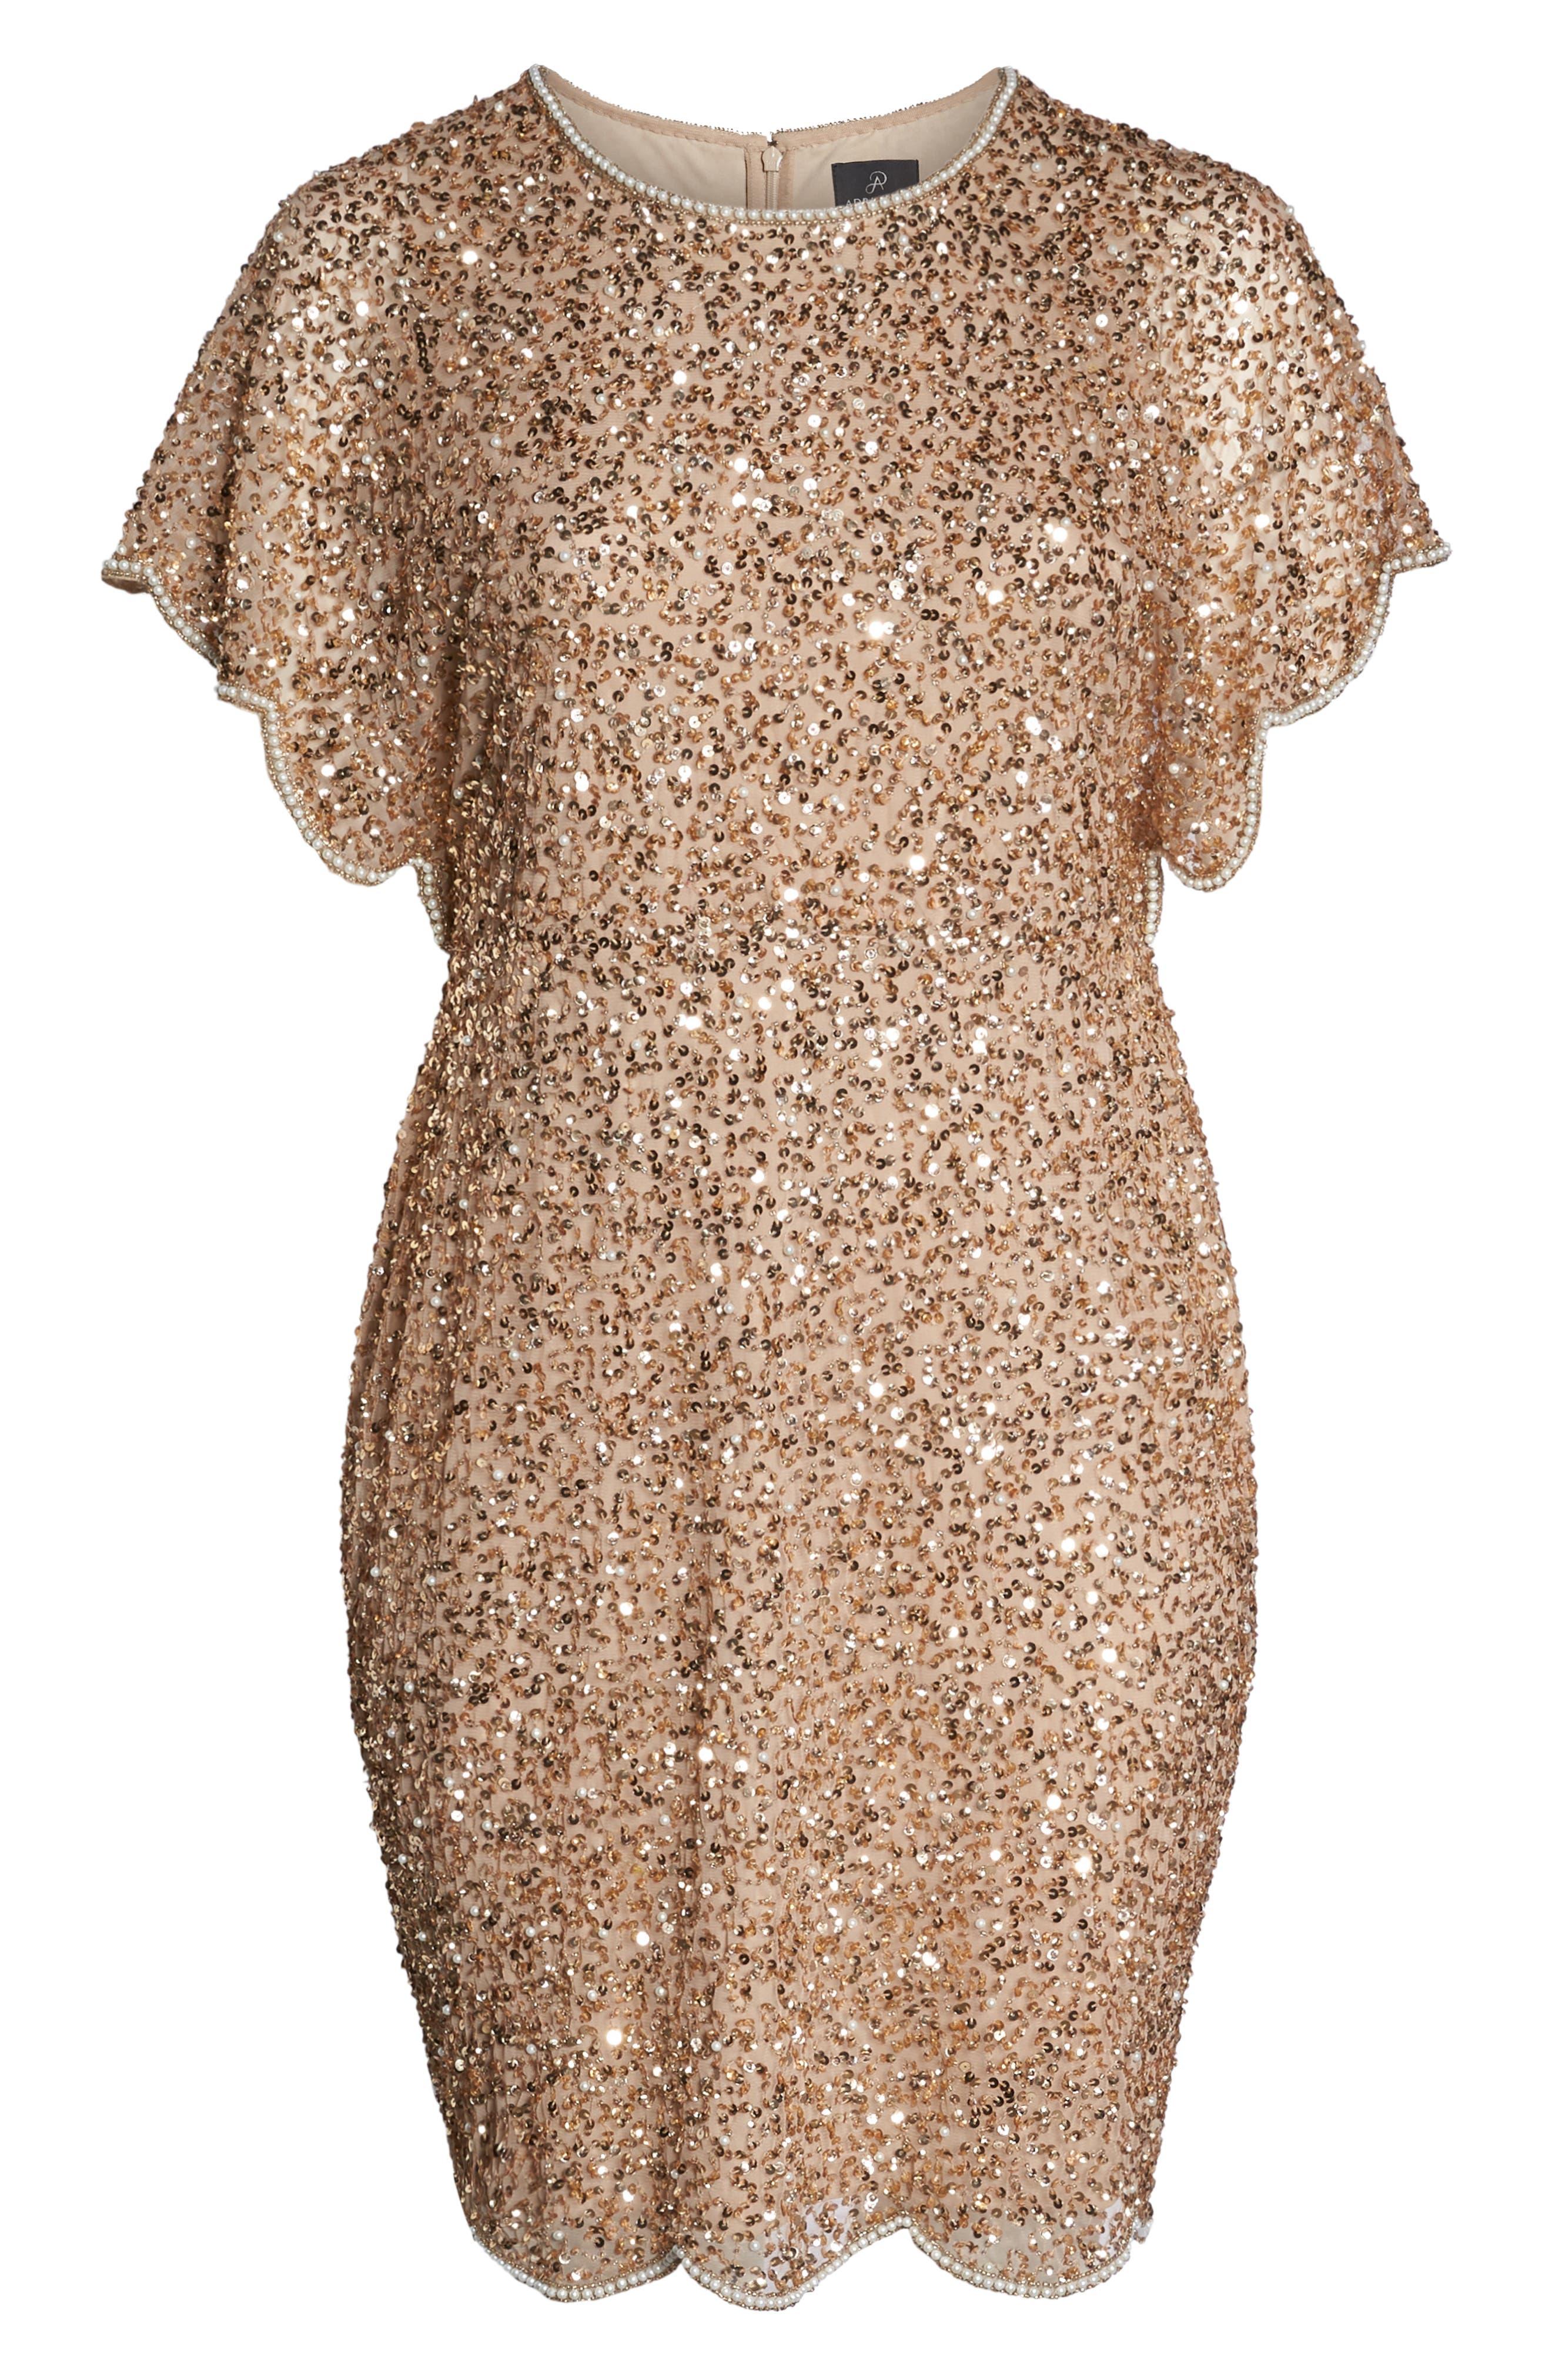 Beaded Flutter Sleeve Sheath Dress,                             Alternate thumbnail 7, color,                             CHAMPAGNE/ GOLD